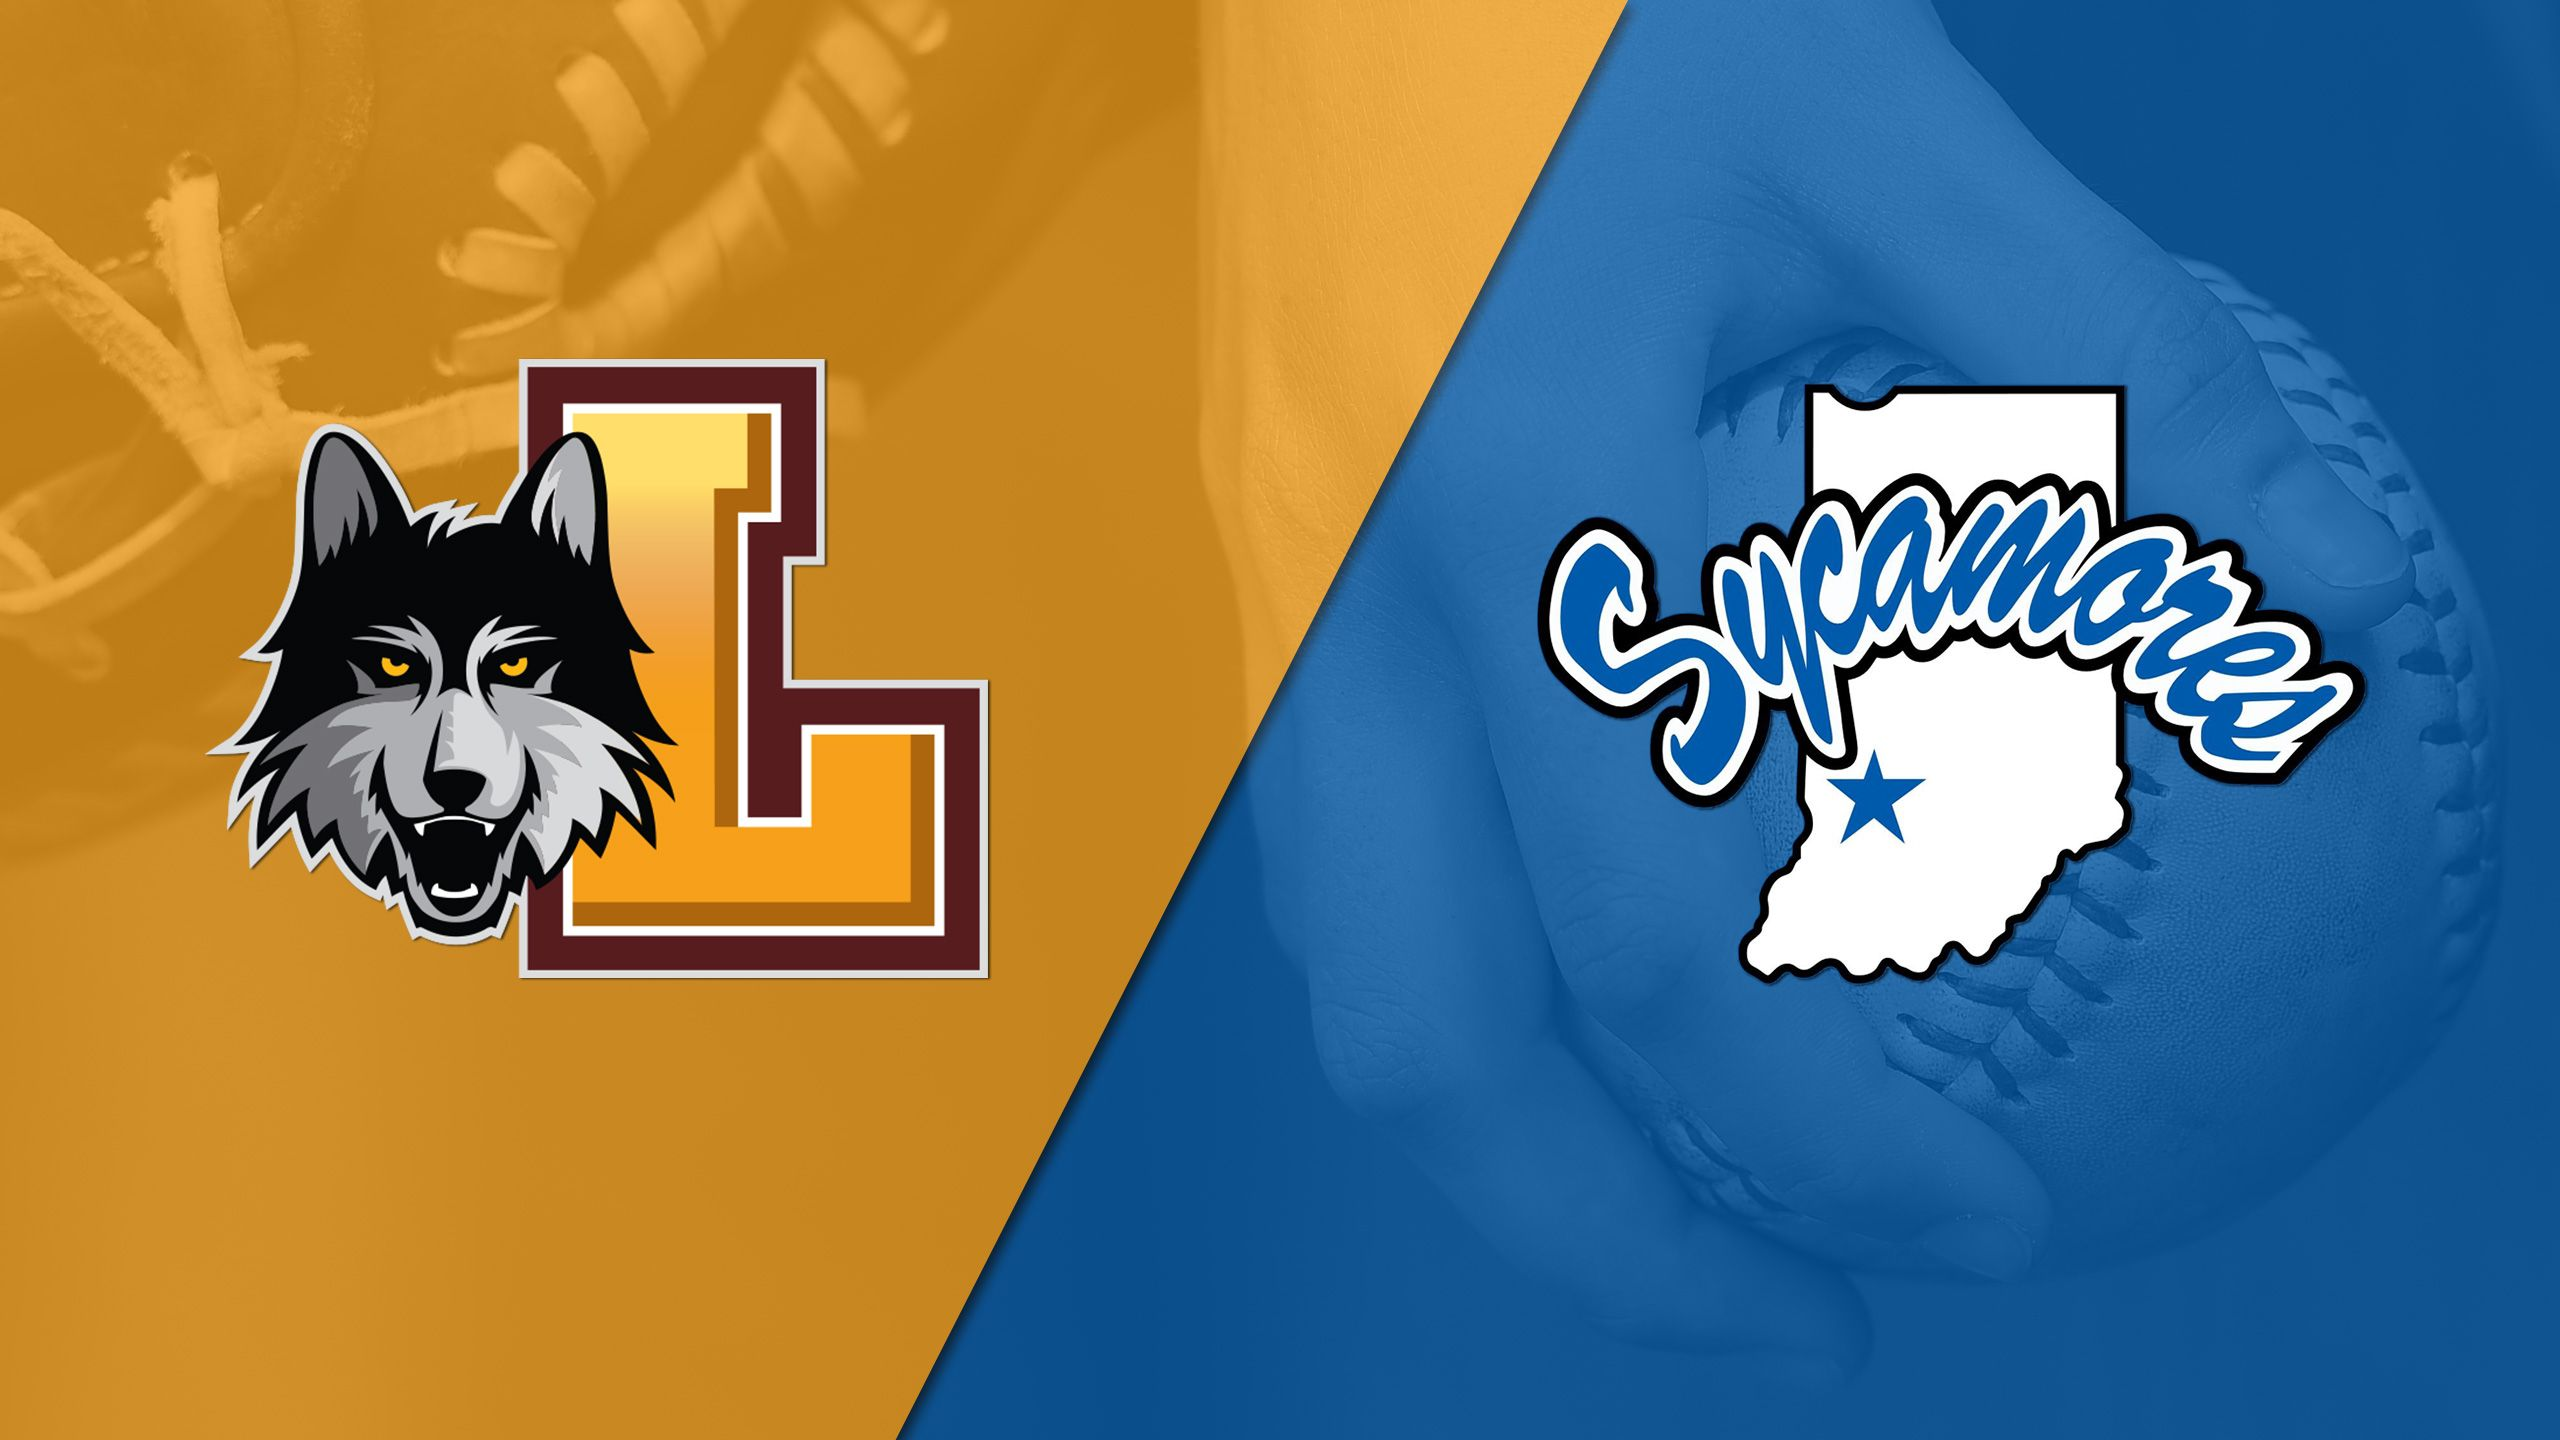 Loyola (IL) vs. Indiana State (Softball)